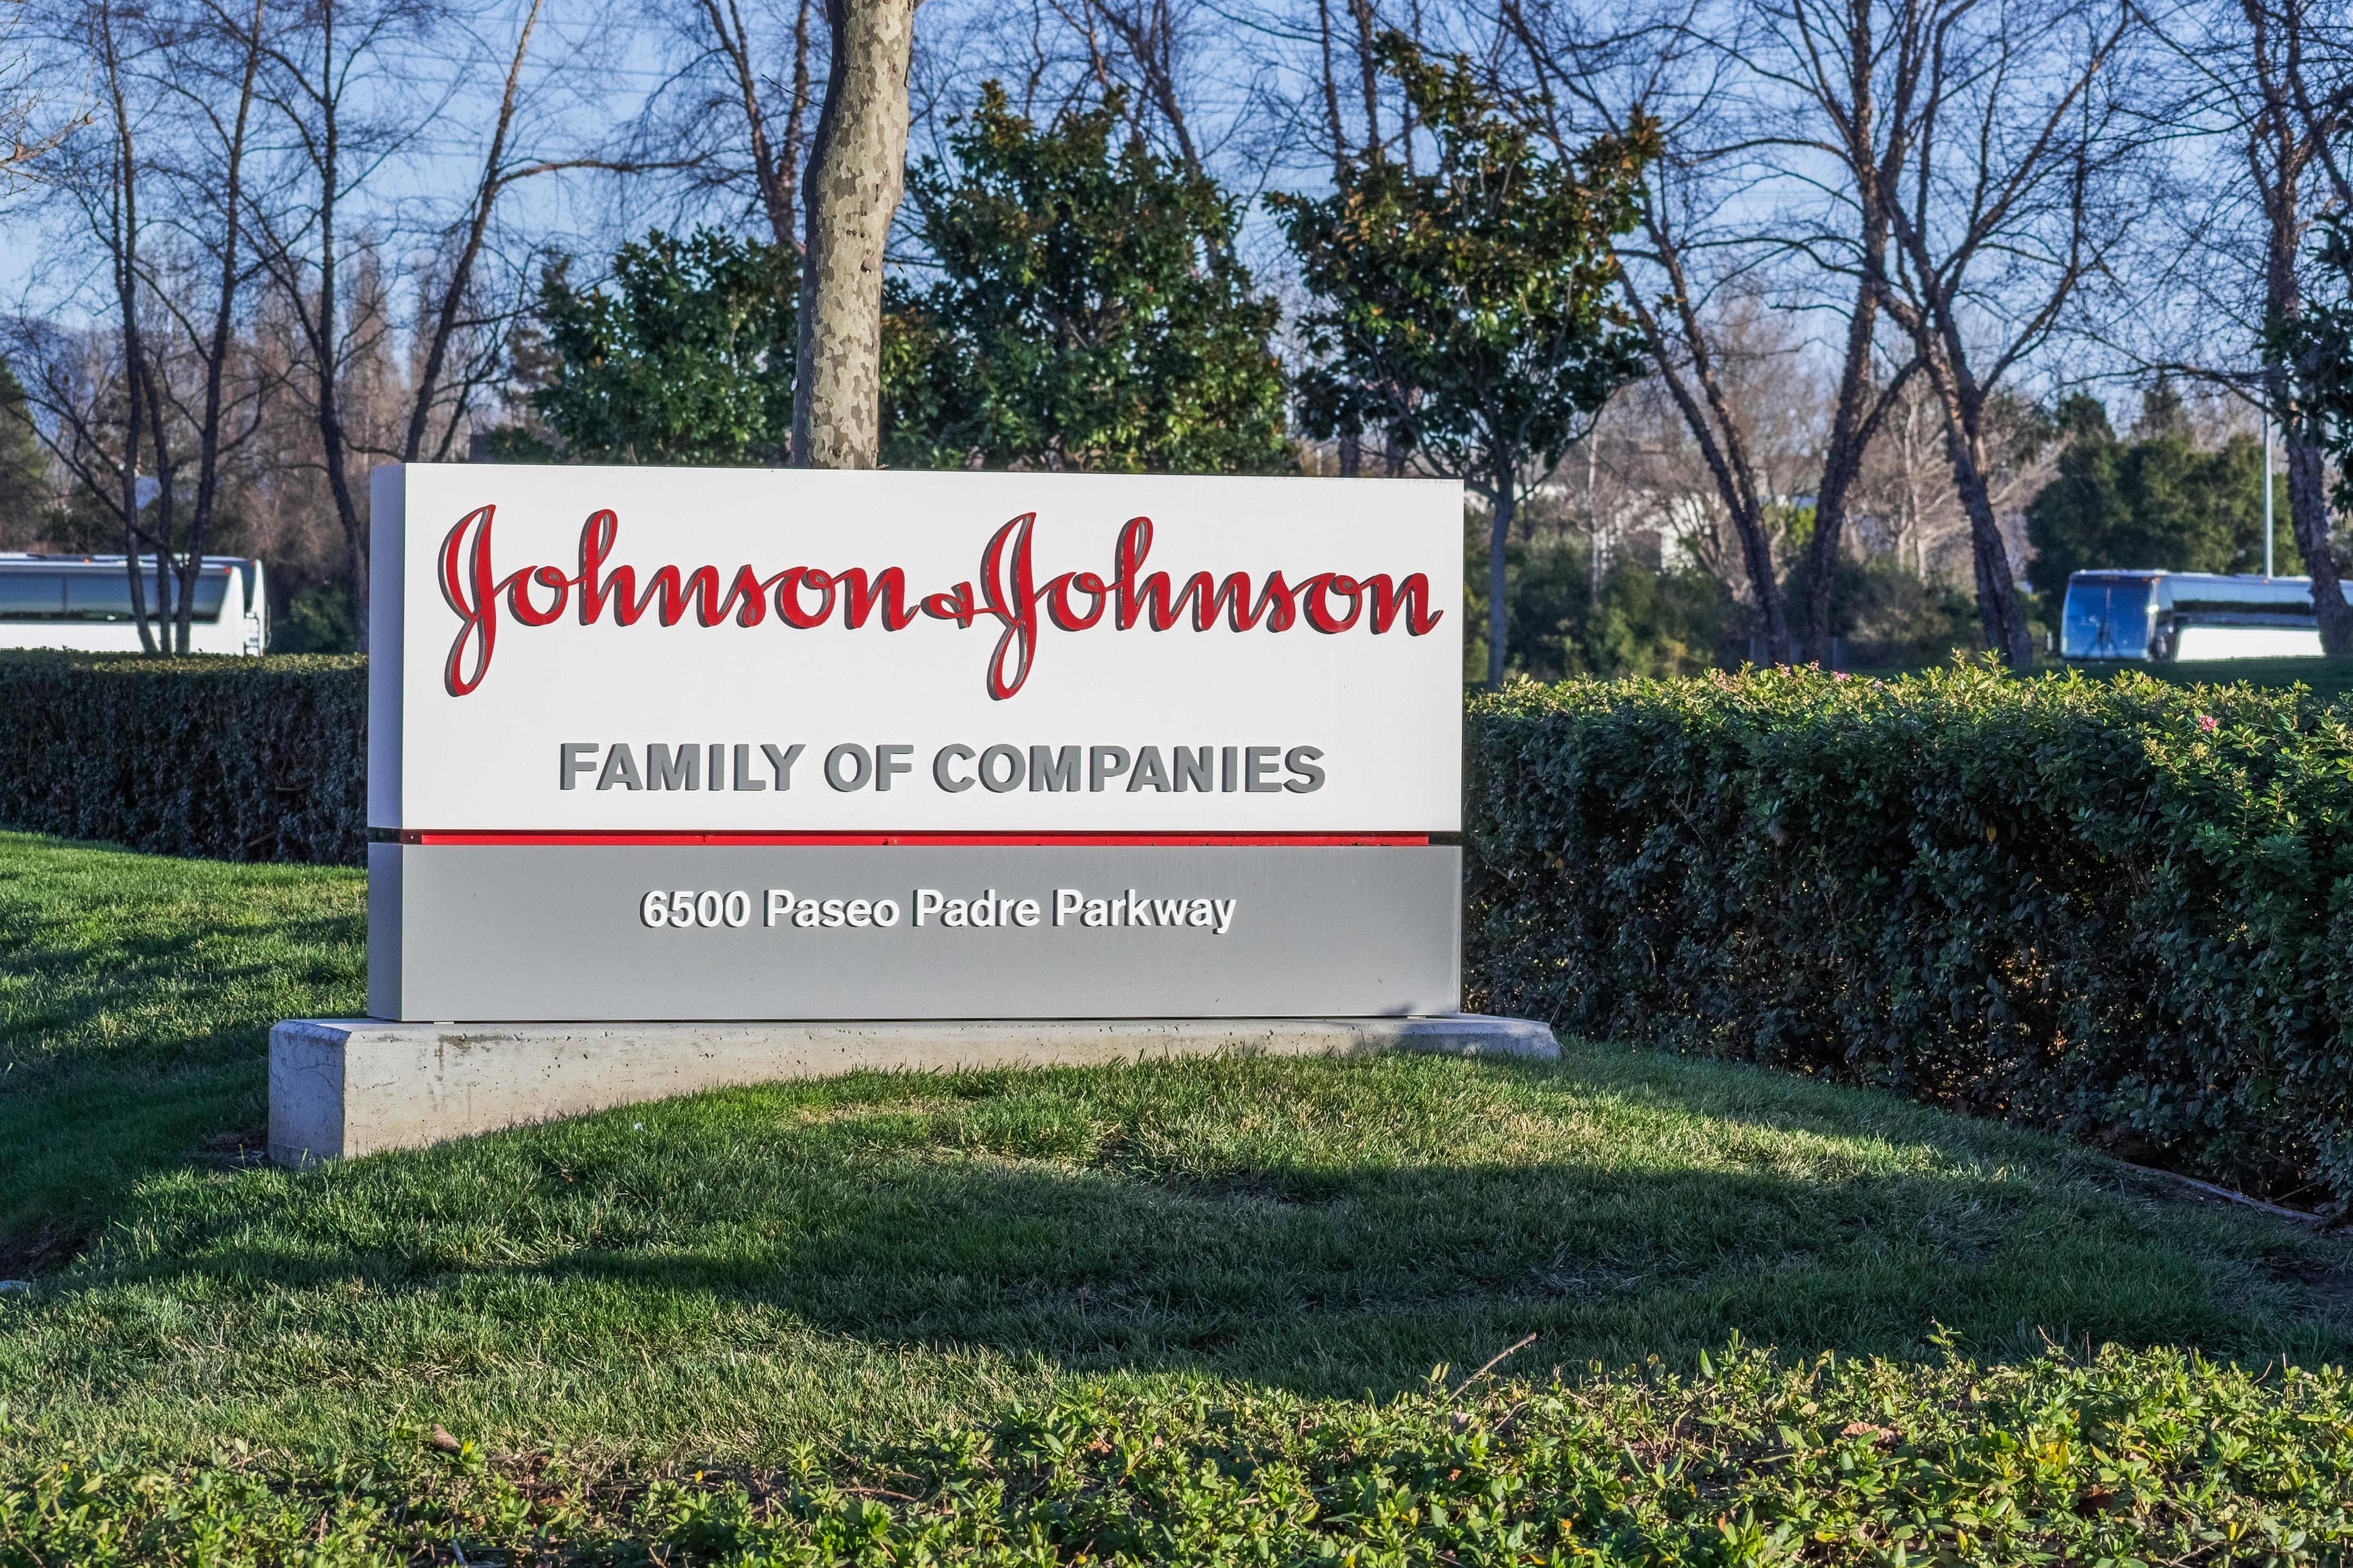 Scientist Job Role Vacant For Phd Chemistry @ Johnson & Johnson